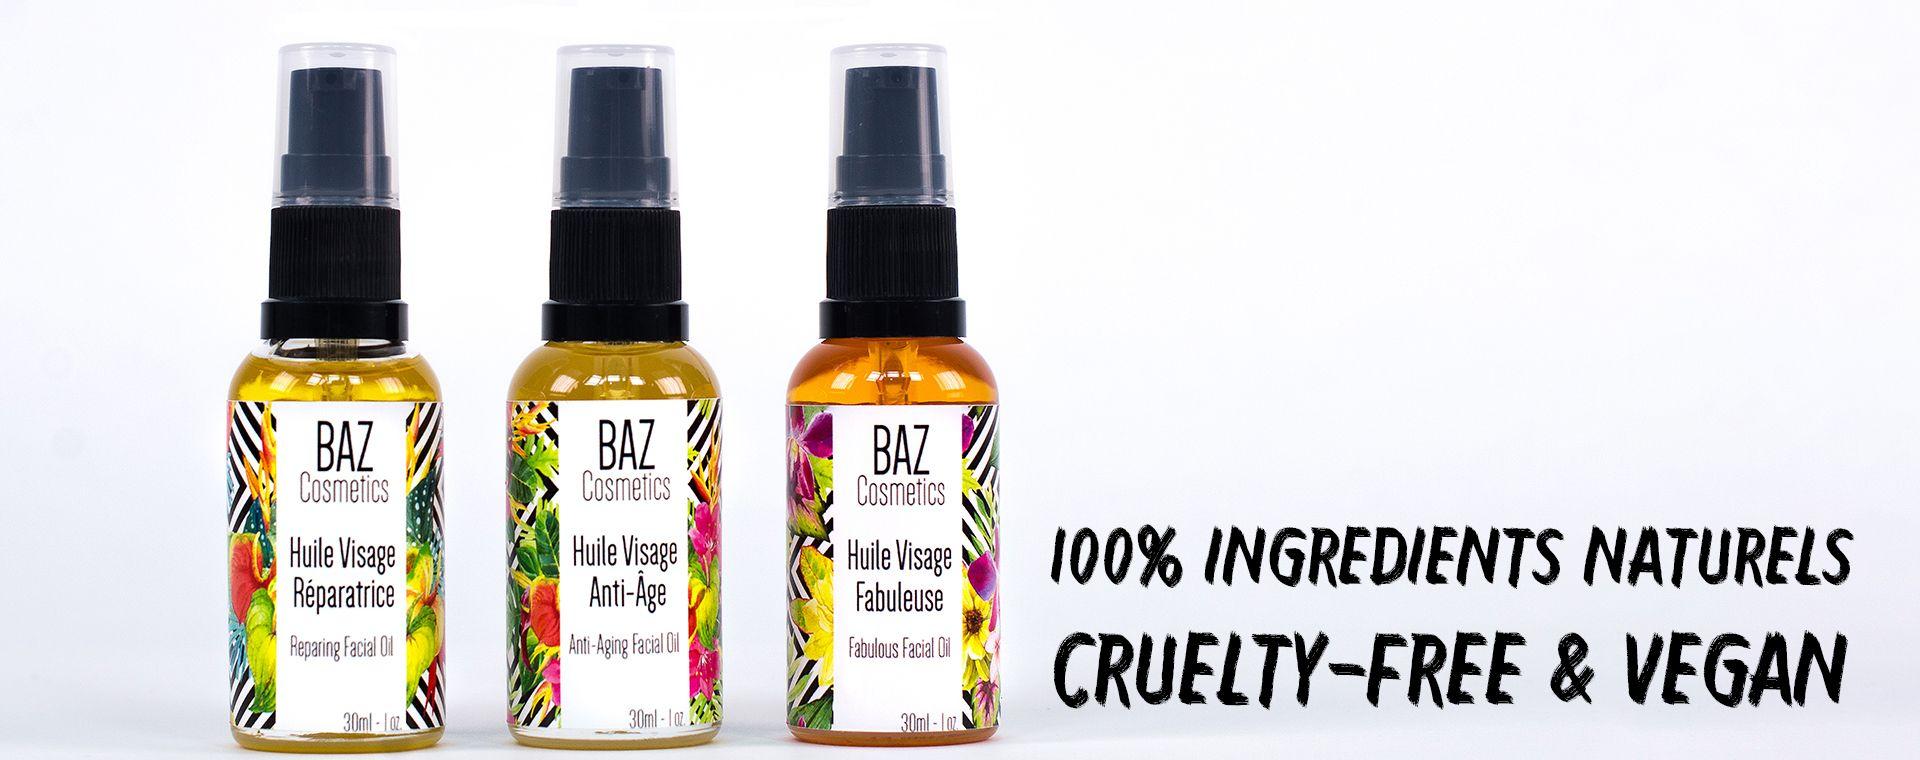 Huiles visage BAZ Cosmetics Vegan, 100 naturelles et